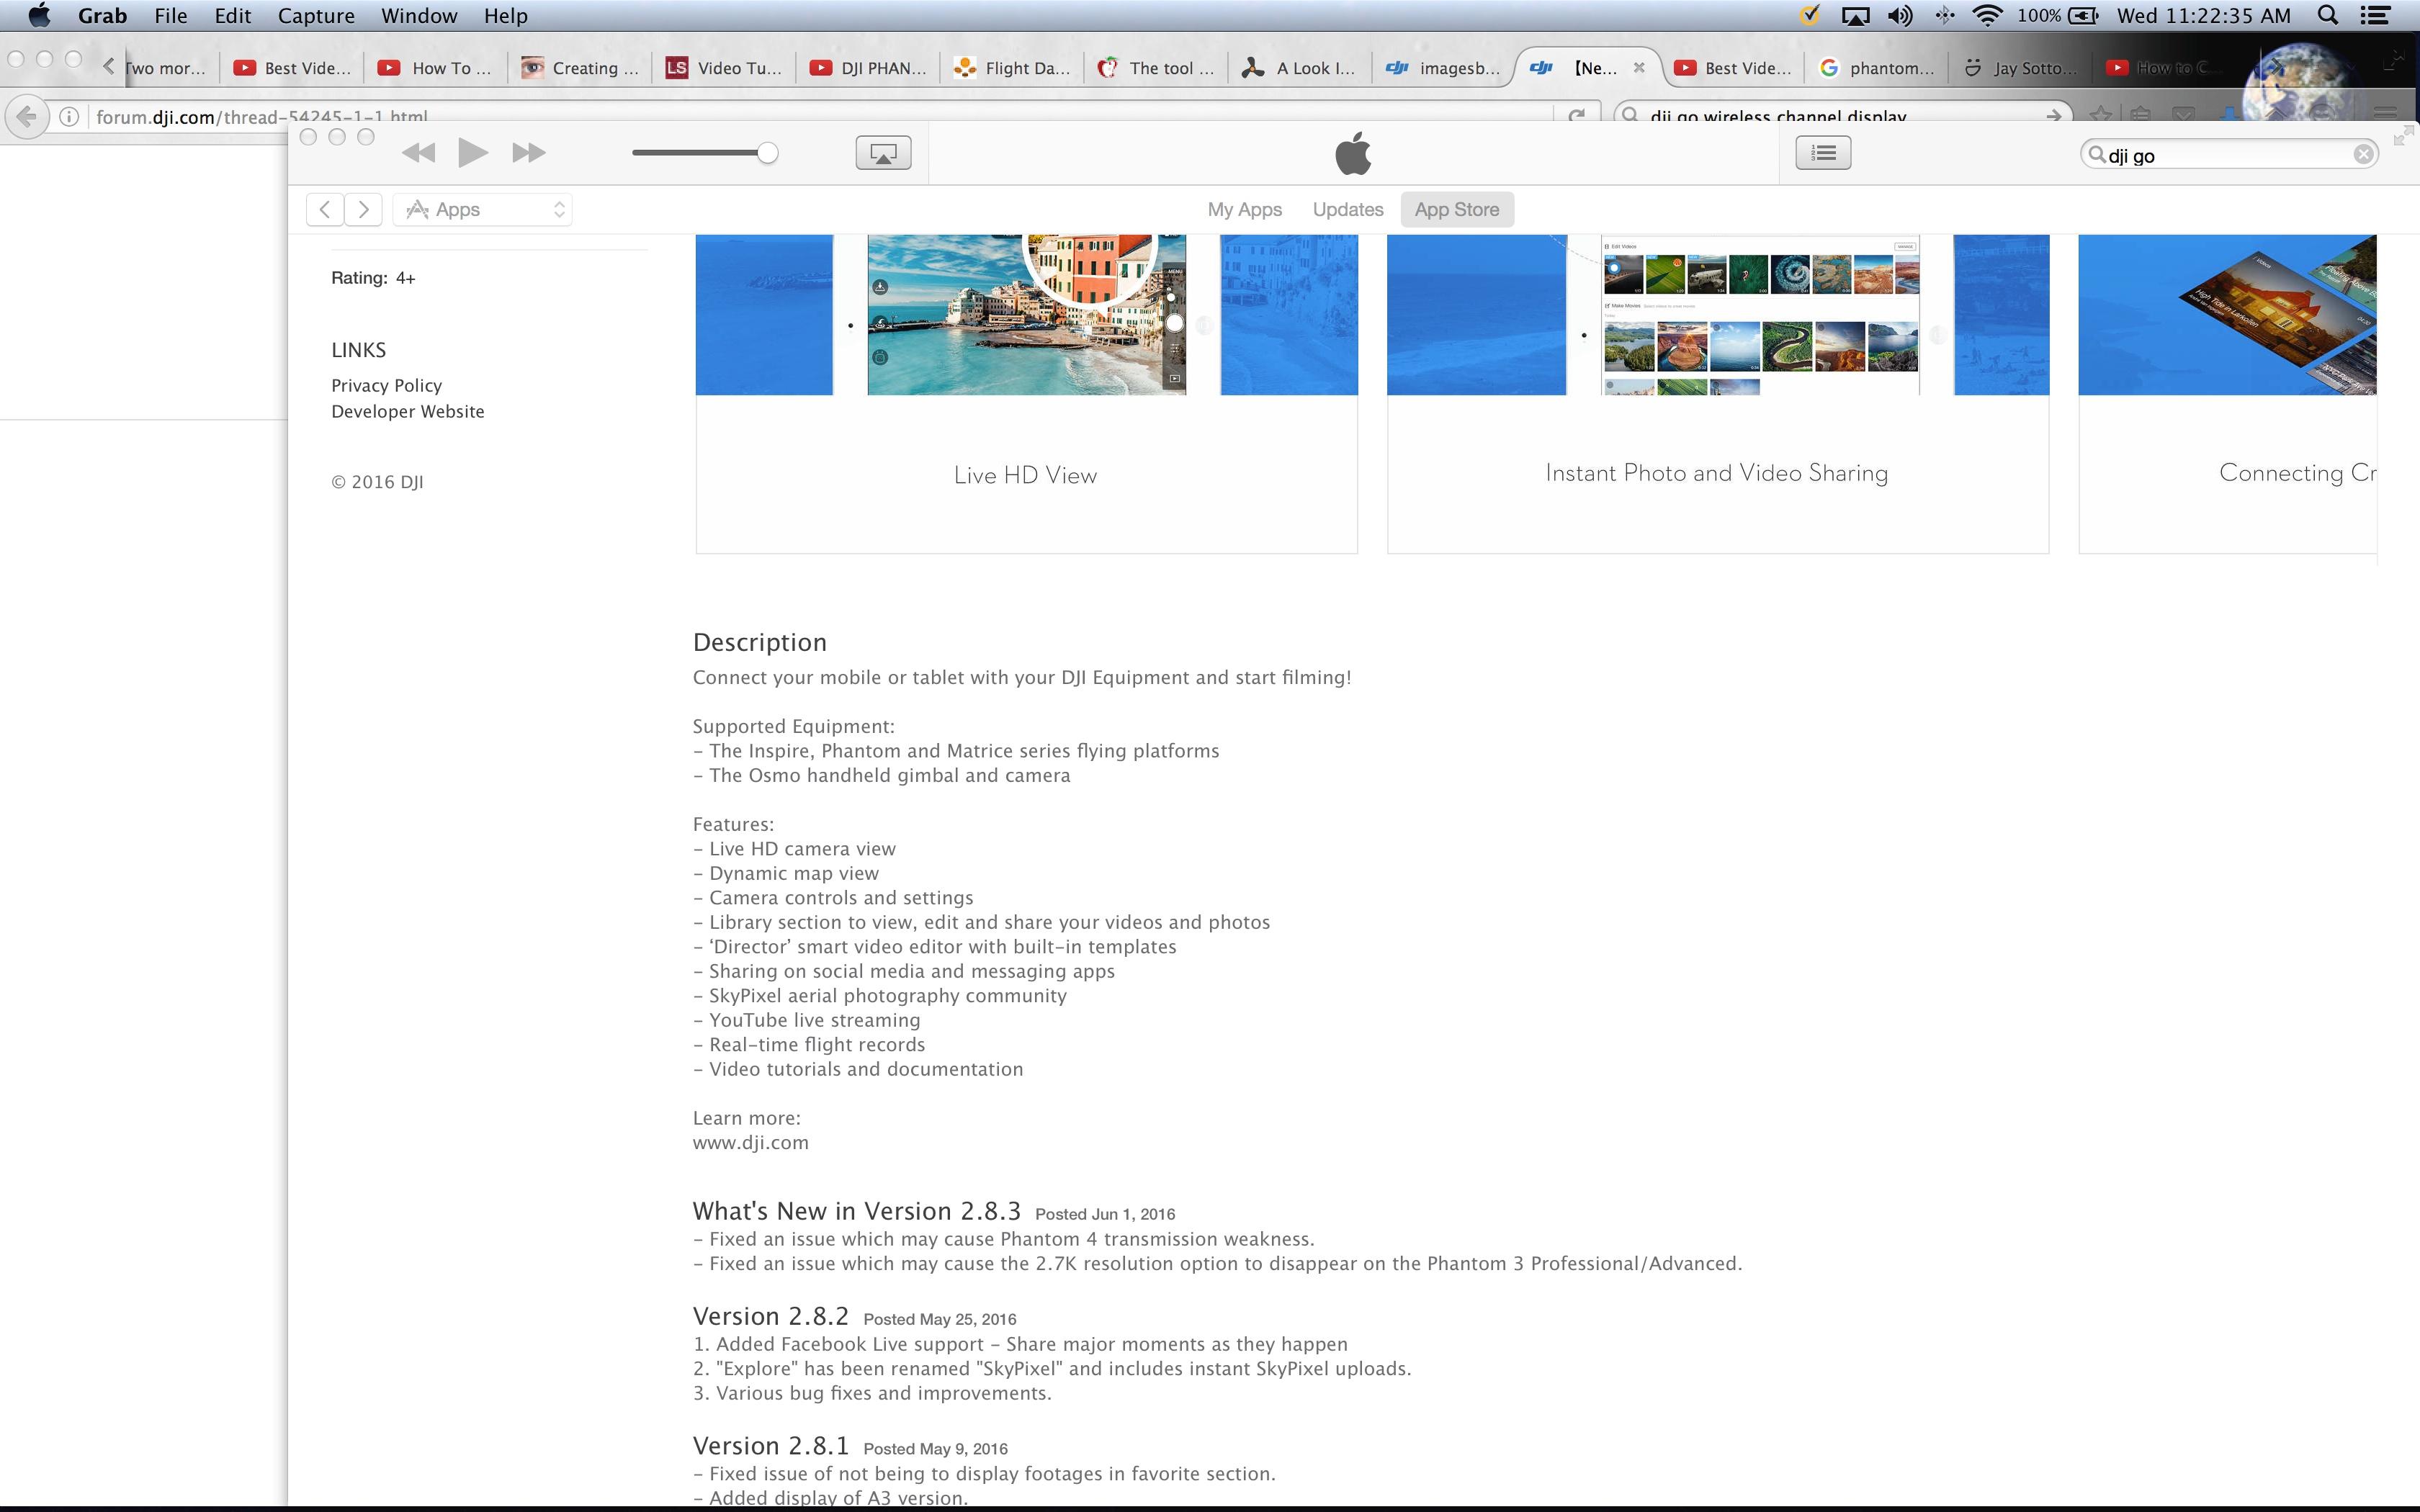 2.8.3 Description in iTunes (and app store)